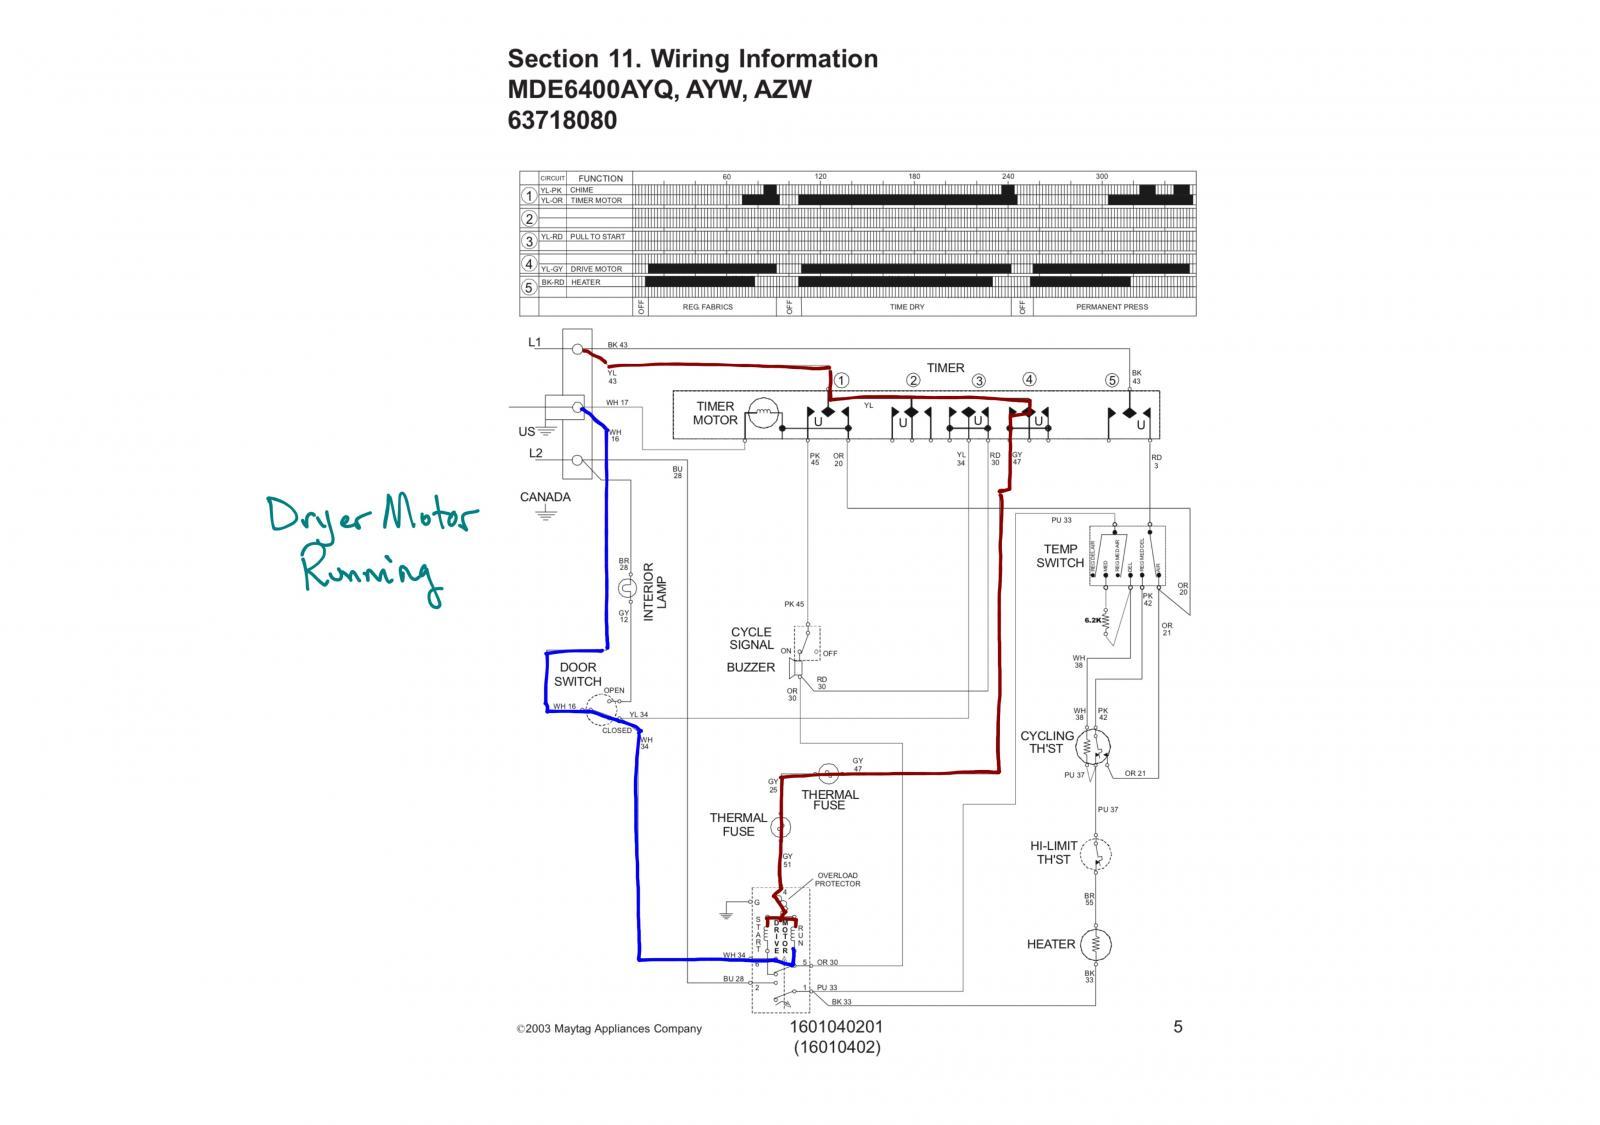 Maytag MDE6400AYQ Dryer Schematic - Drive Motor Running